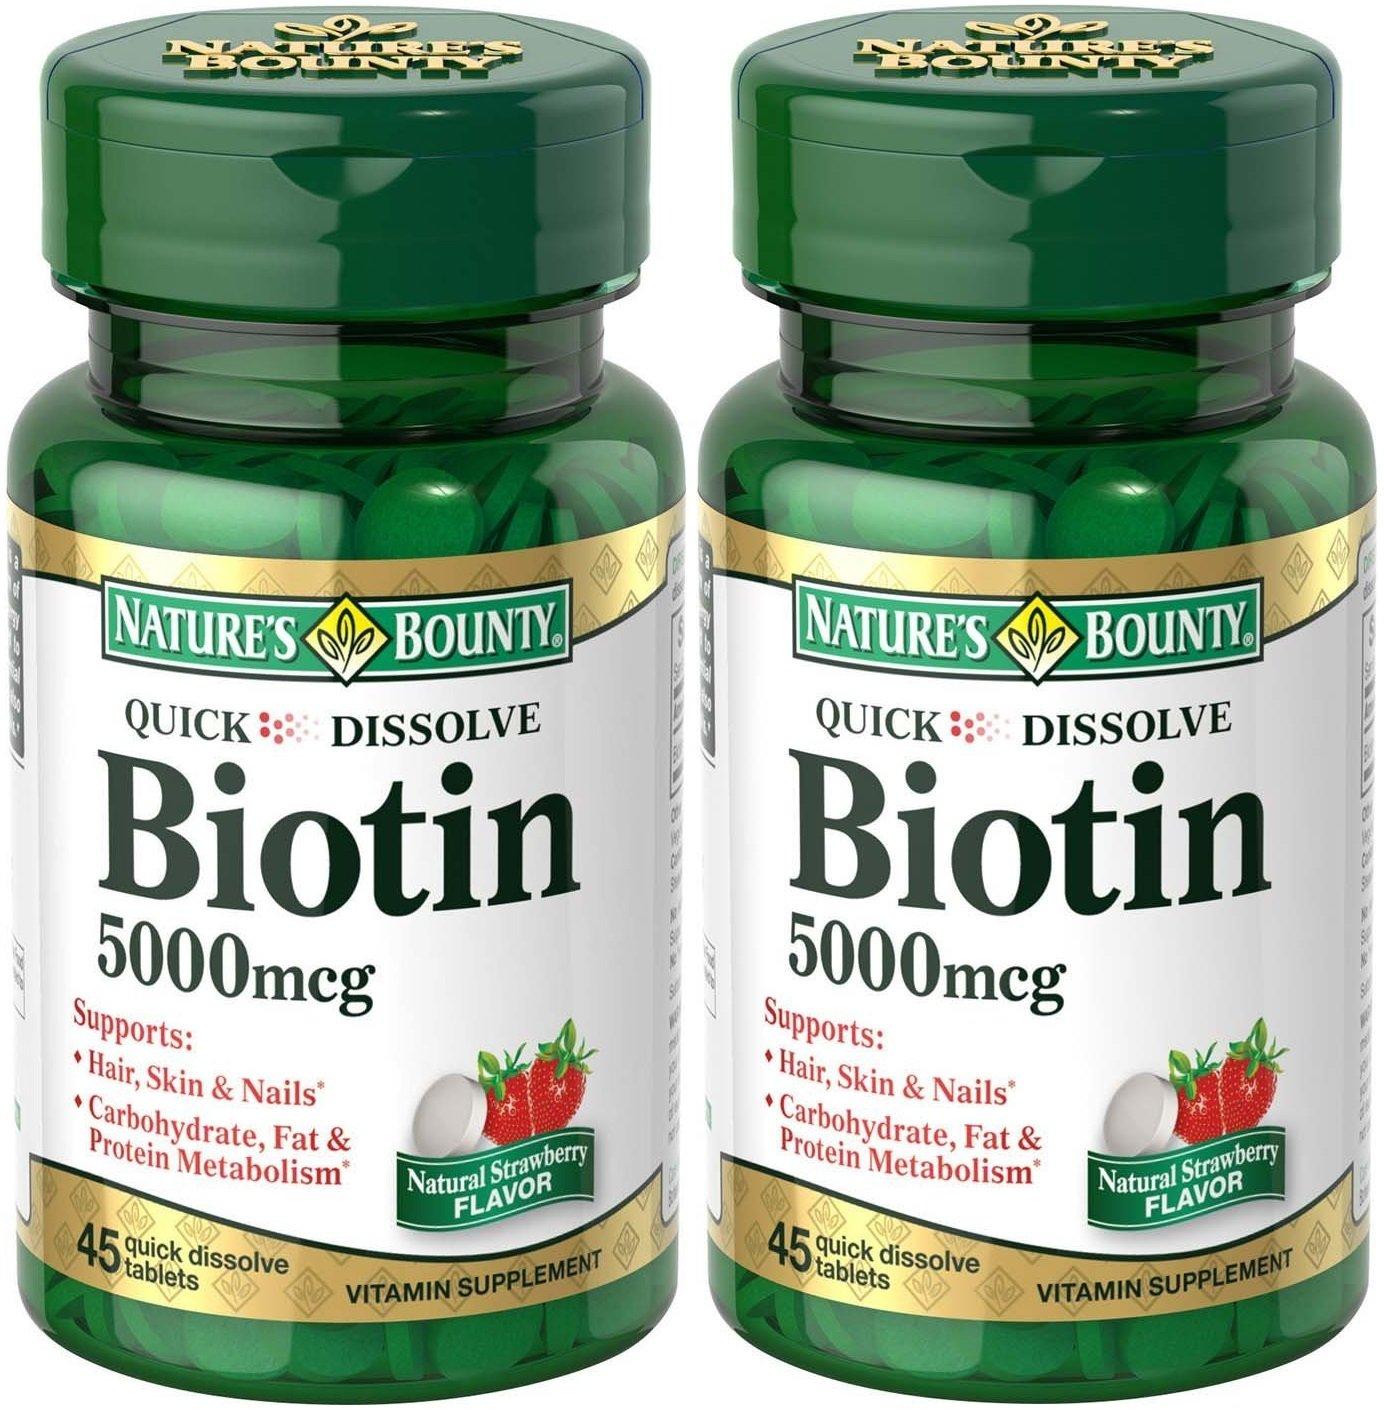 Natures Bounty Biotin Quick Dissolve Tablets, 5000 mcg, 90 Tablets (2 X 45 Count Bottles)